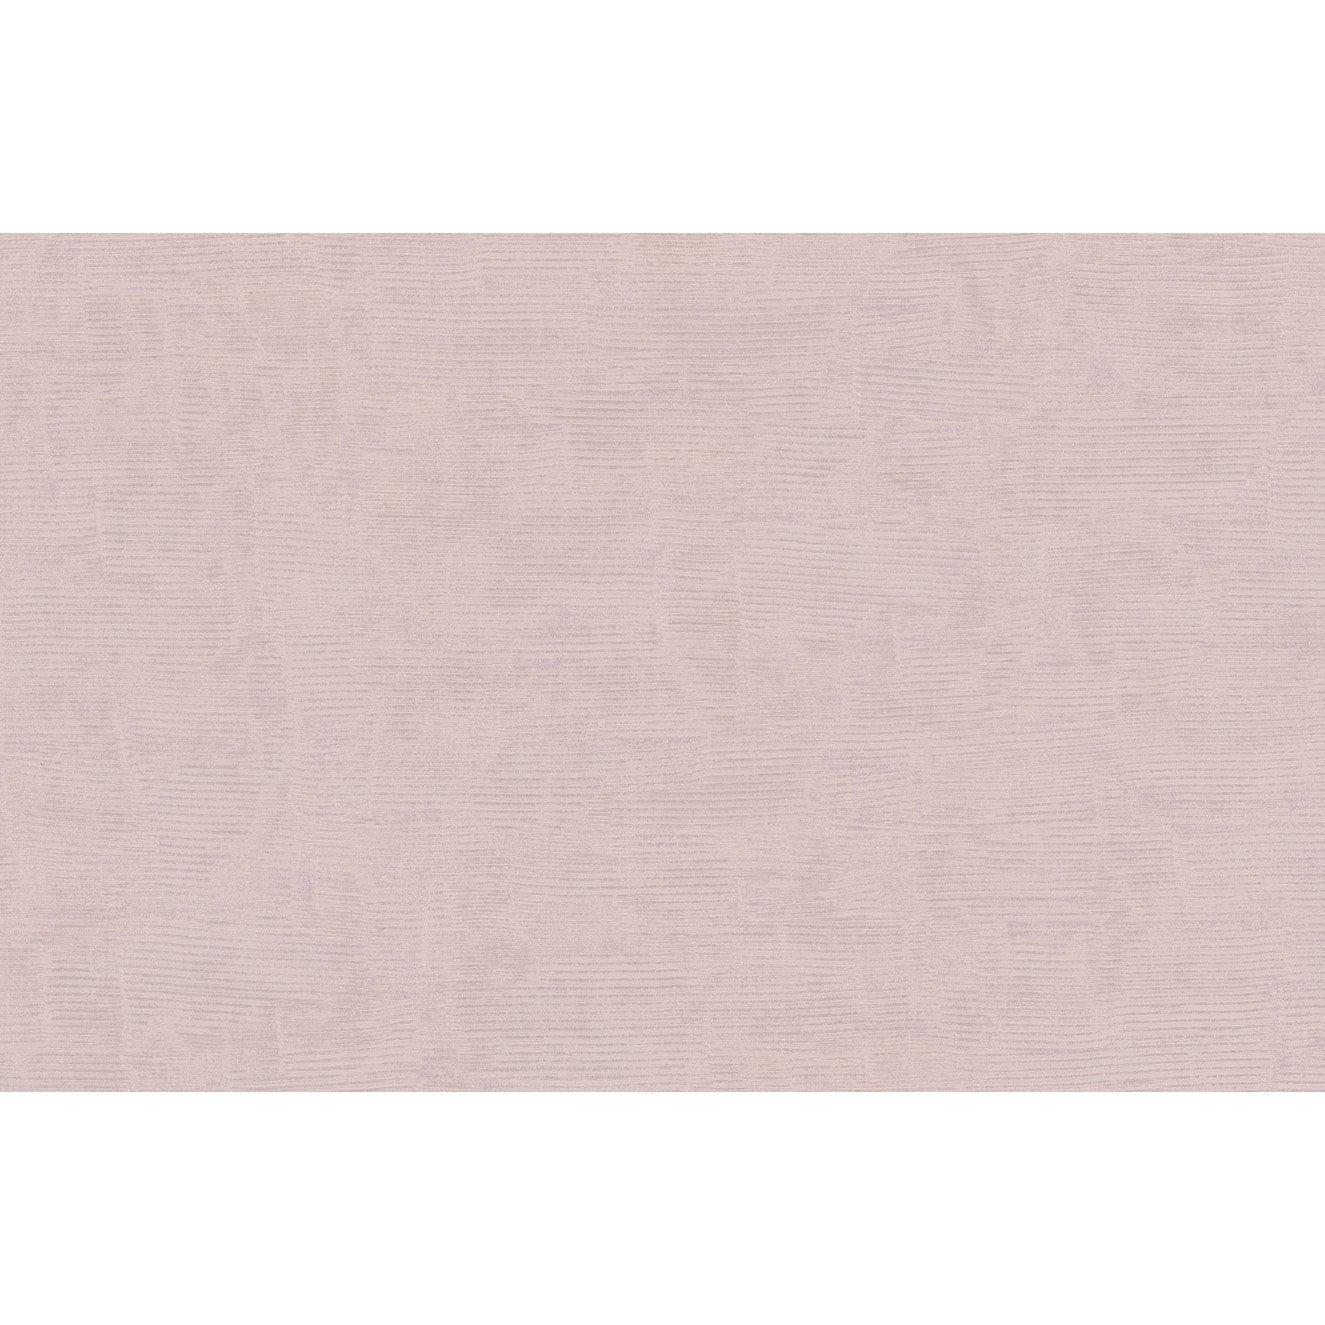 papier peint romance rose papier italian color leroy merlin. Black Bedroom Furniture Sets. Home Design Ideas